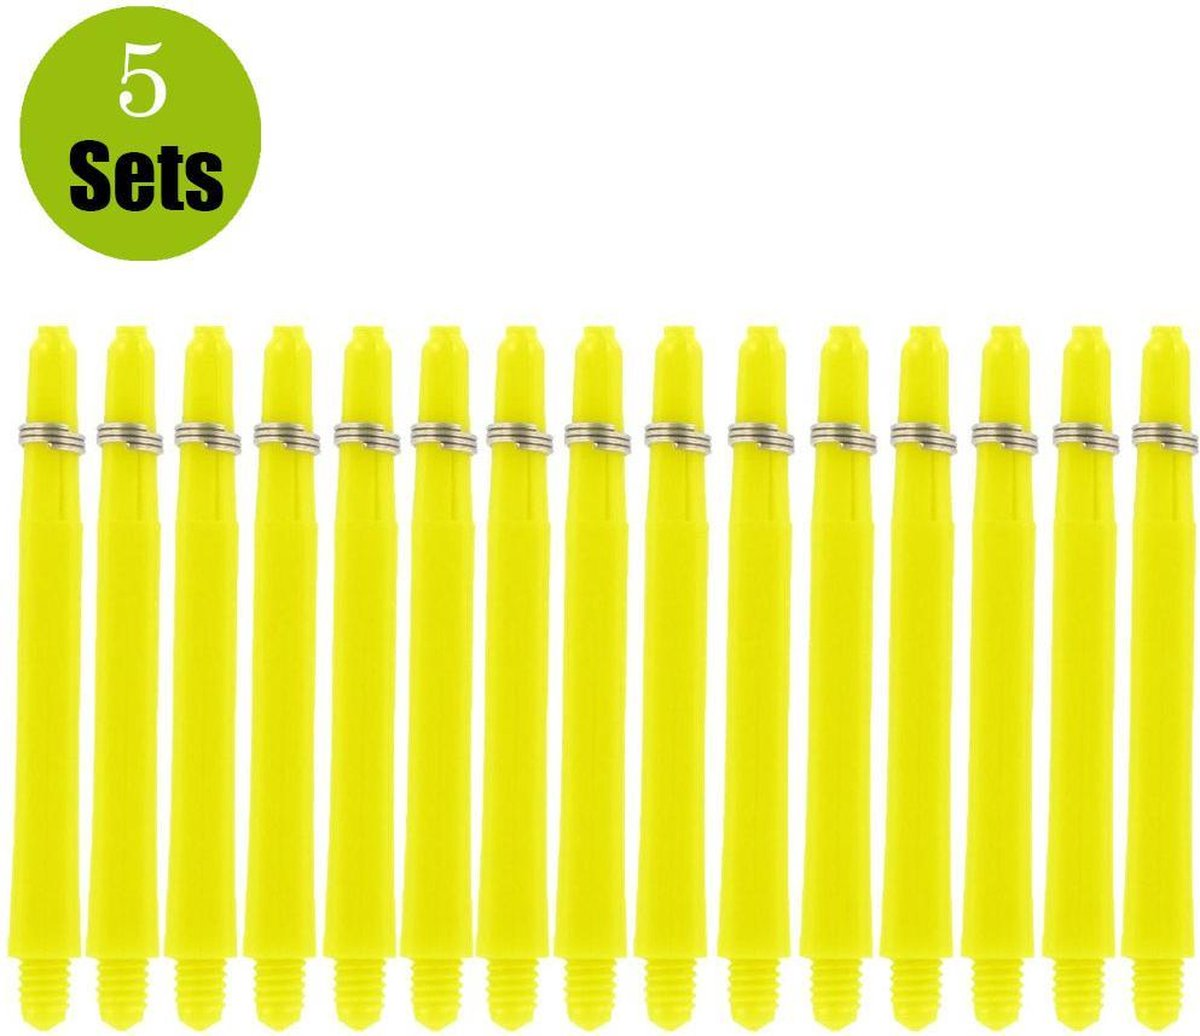 Bulls Nylon 5Sets DartShafts - Geel - Short - (5 Sets)